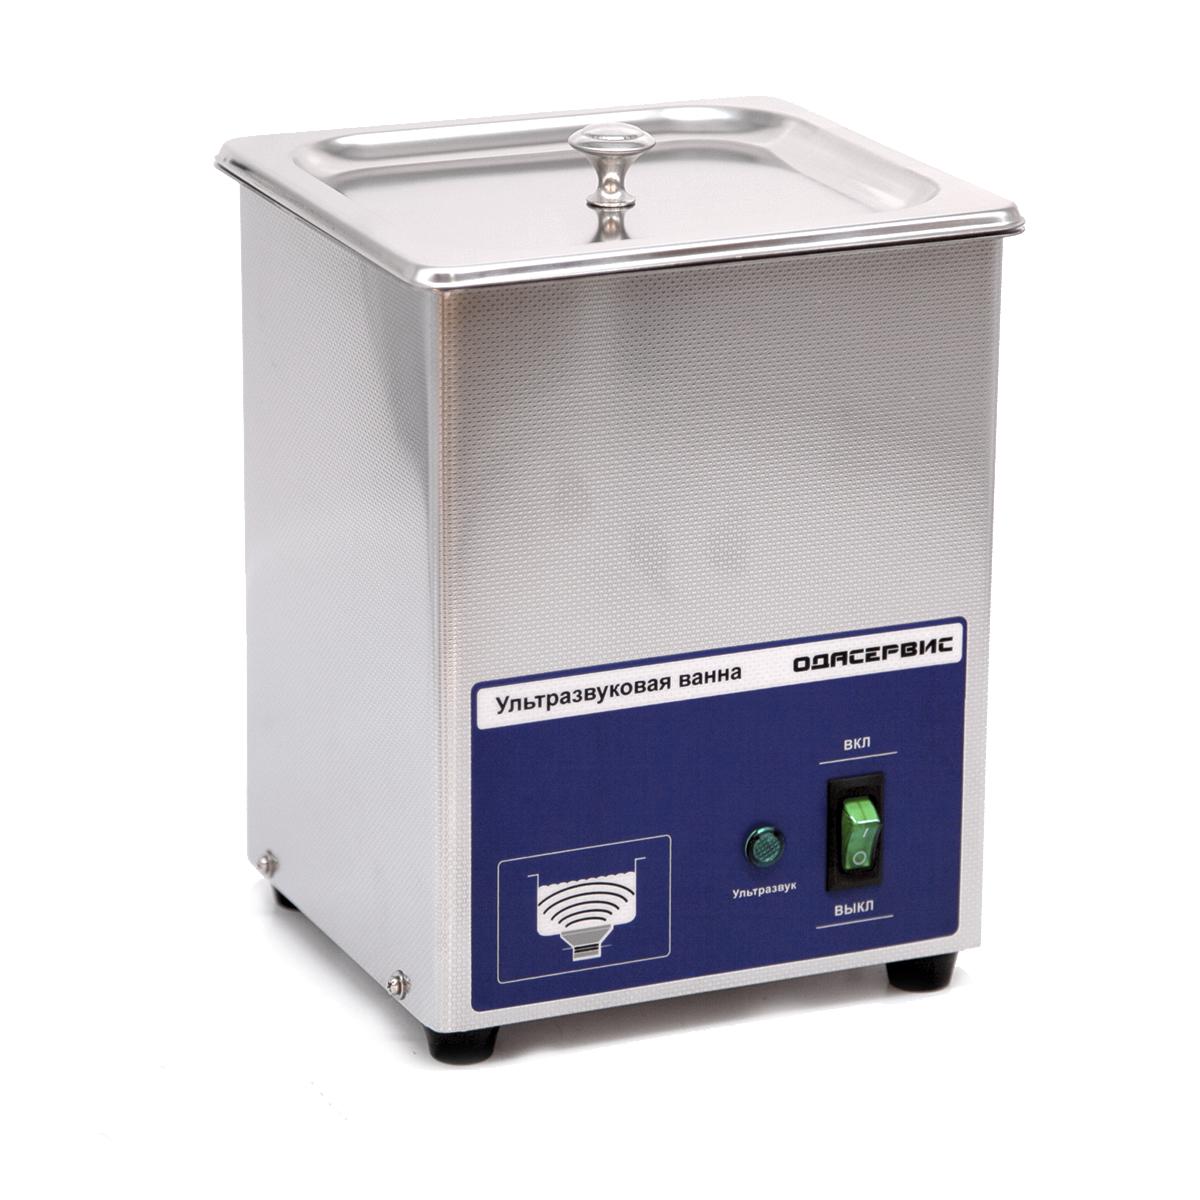 Ультразвуковая ванна 2 л ОДА Сервис ODA-M20